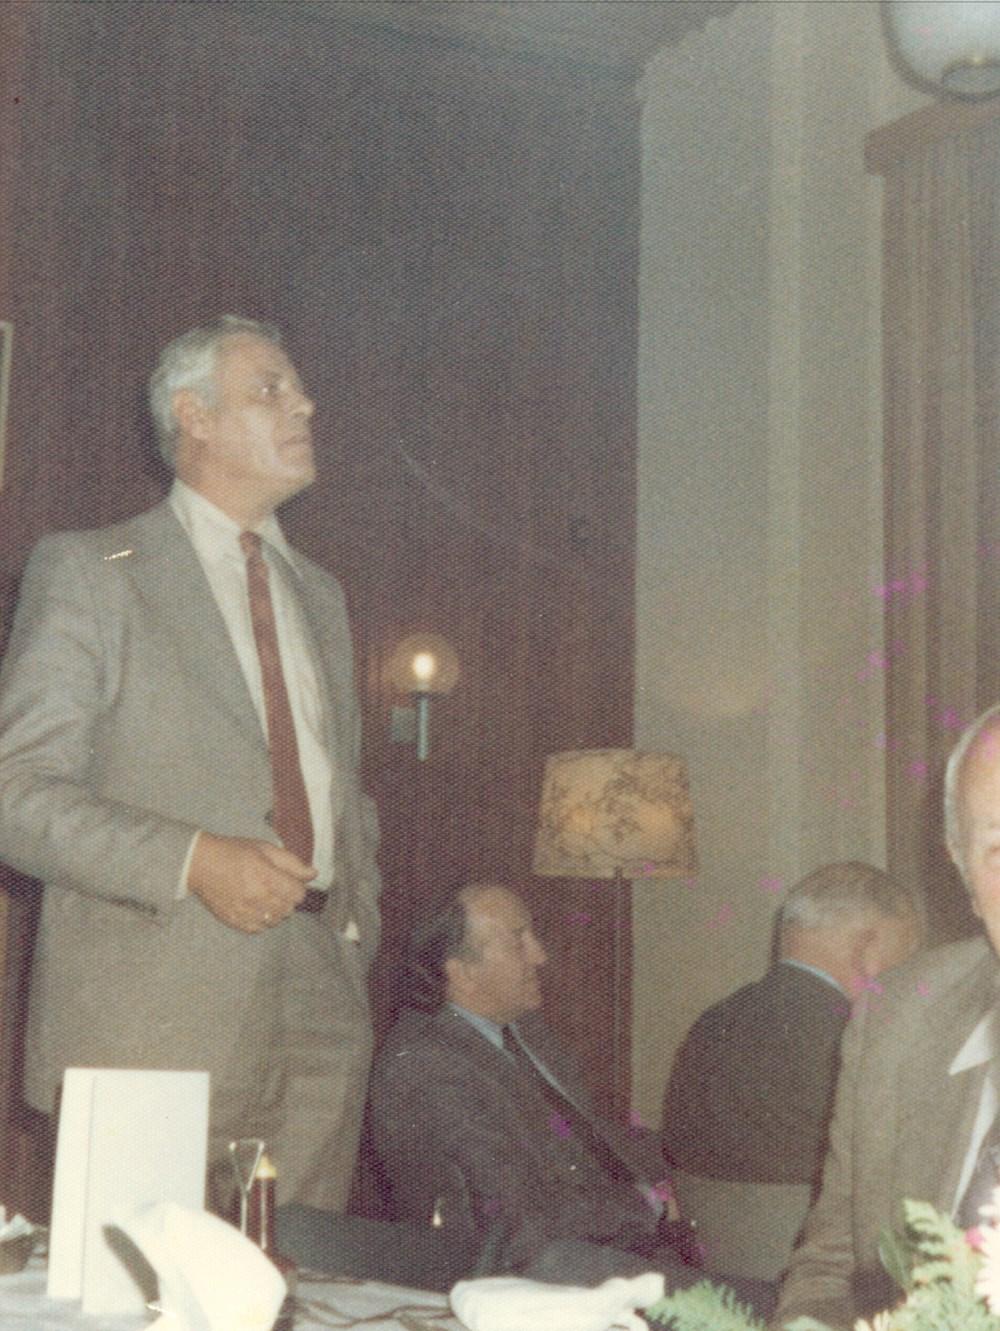 1976 Verenigingsleven Tussentijdse reünie (diner)